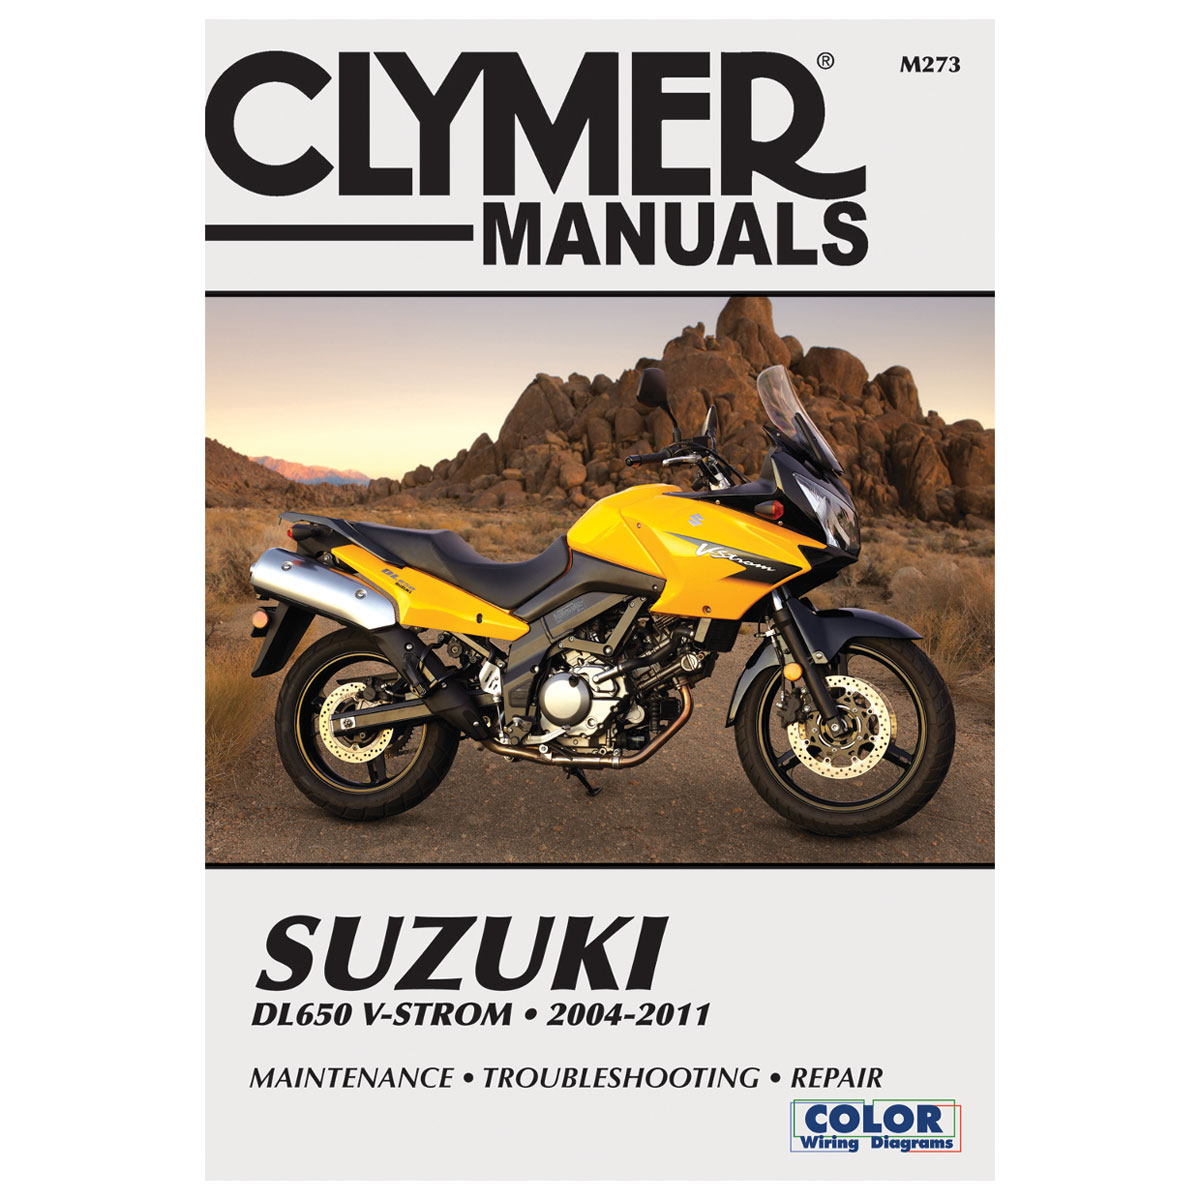 clymer suzuki motorcycle repair manual 181 2351 j p cycles rh jpcycles com Clymer Reamer Specs Clymer Manuals Kawasaki